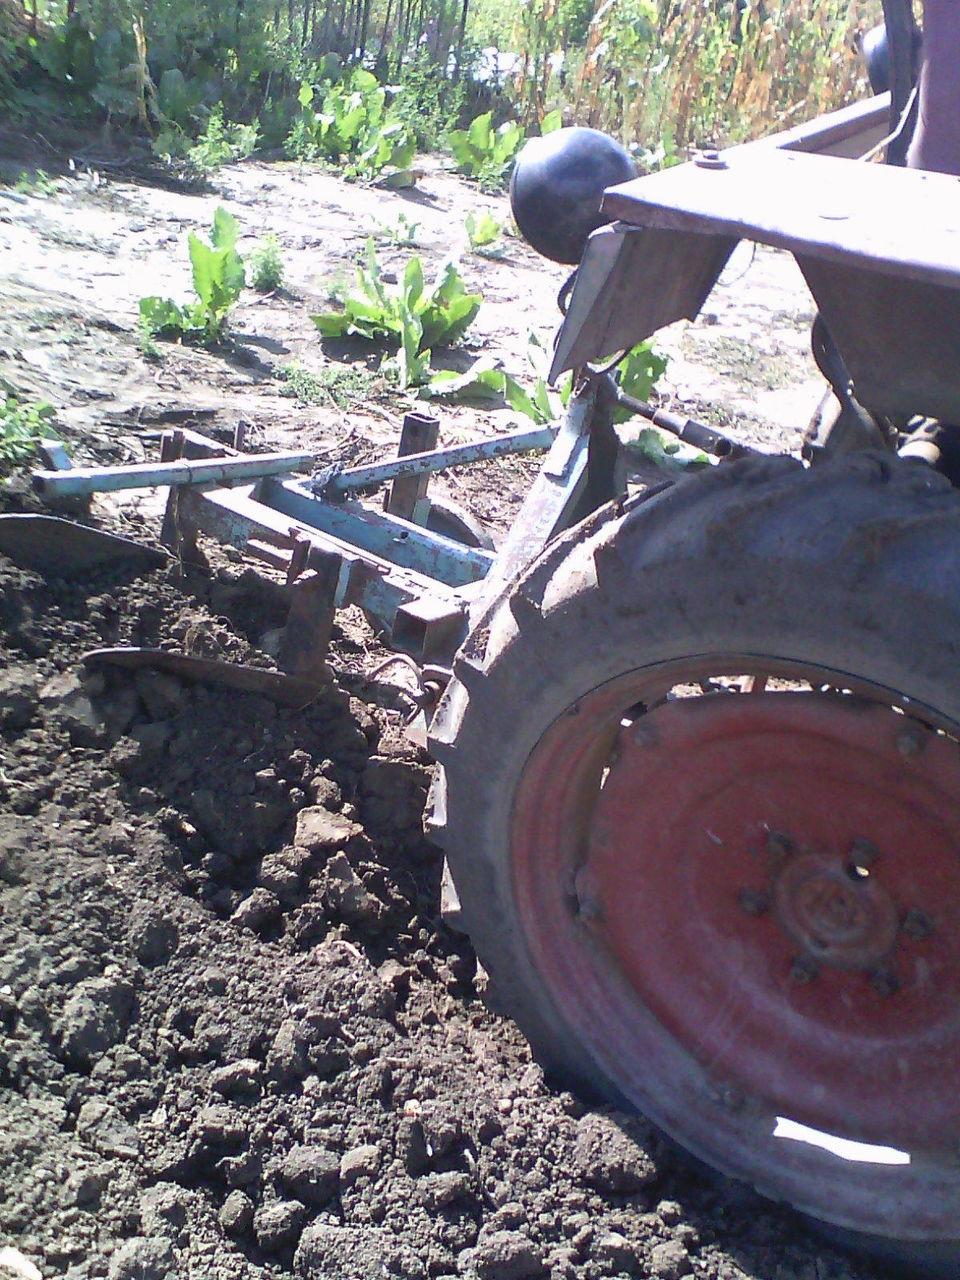 Сельхозтехника в Молдове: Запчасти Джон Дир, Клаас, Сампо